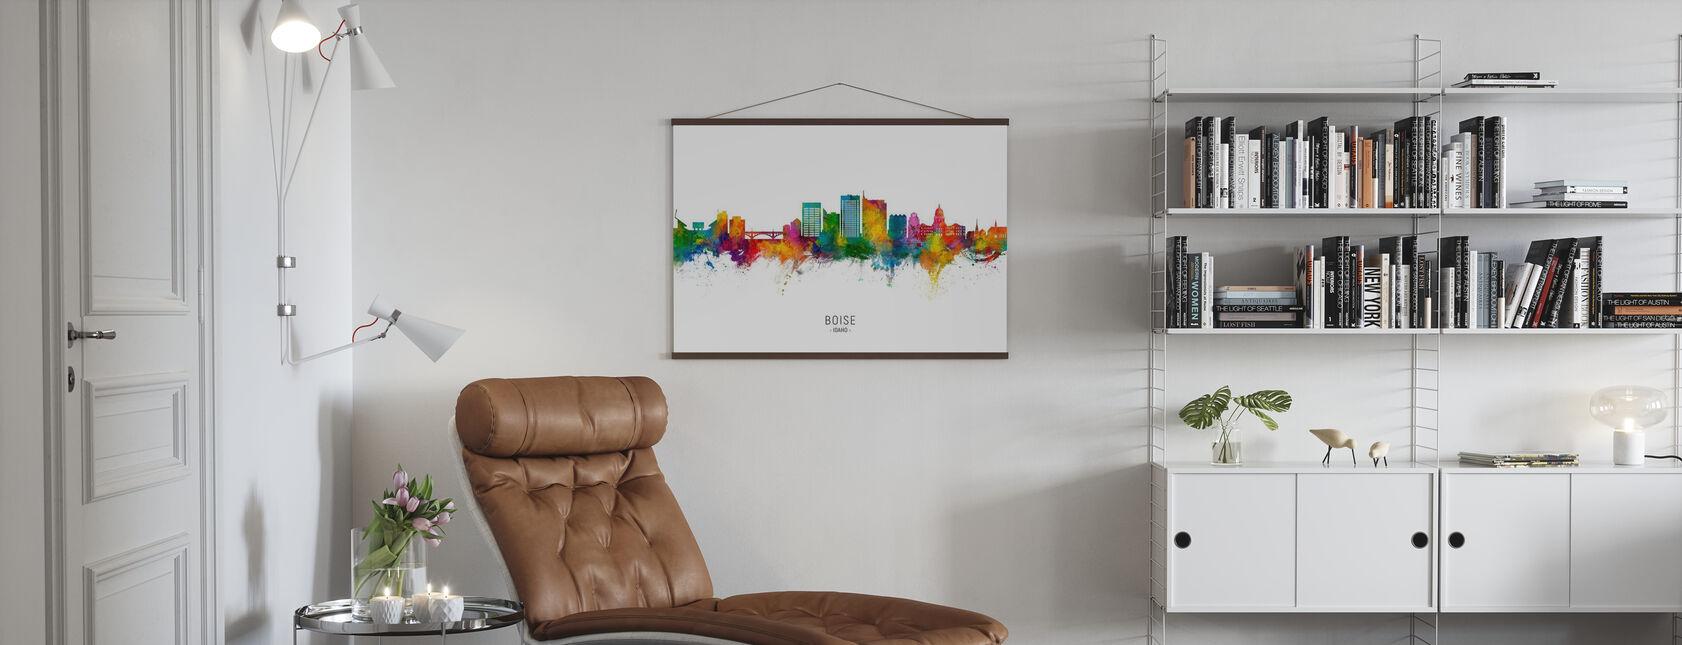 Boise Idaho Skyline - Plakat - Stue